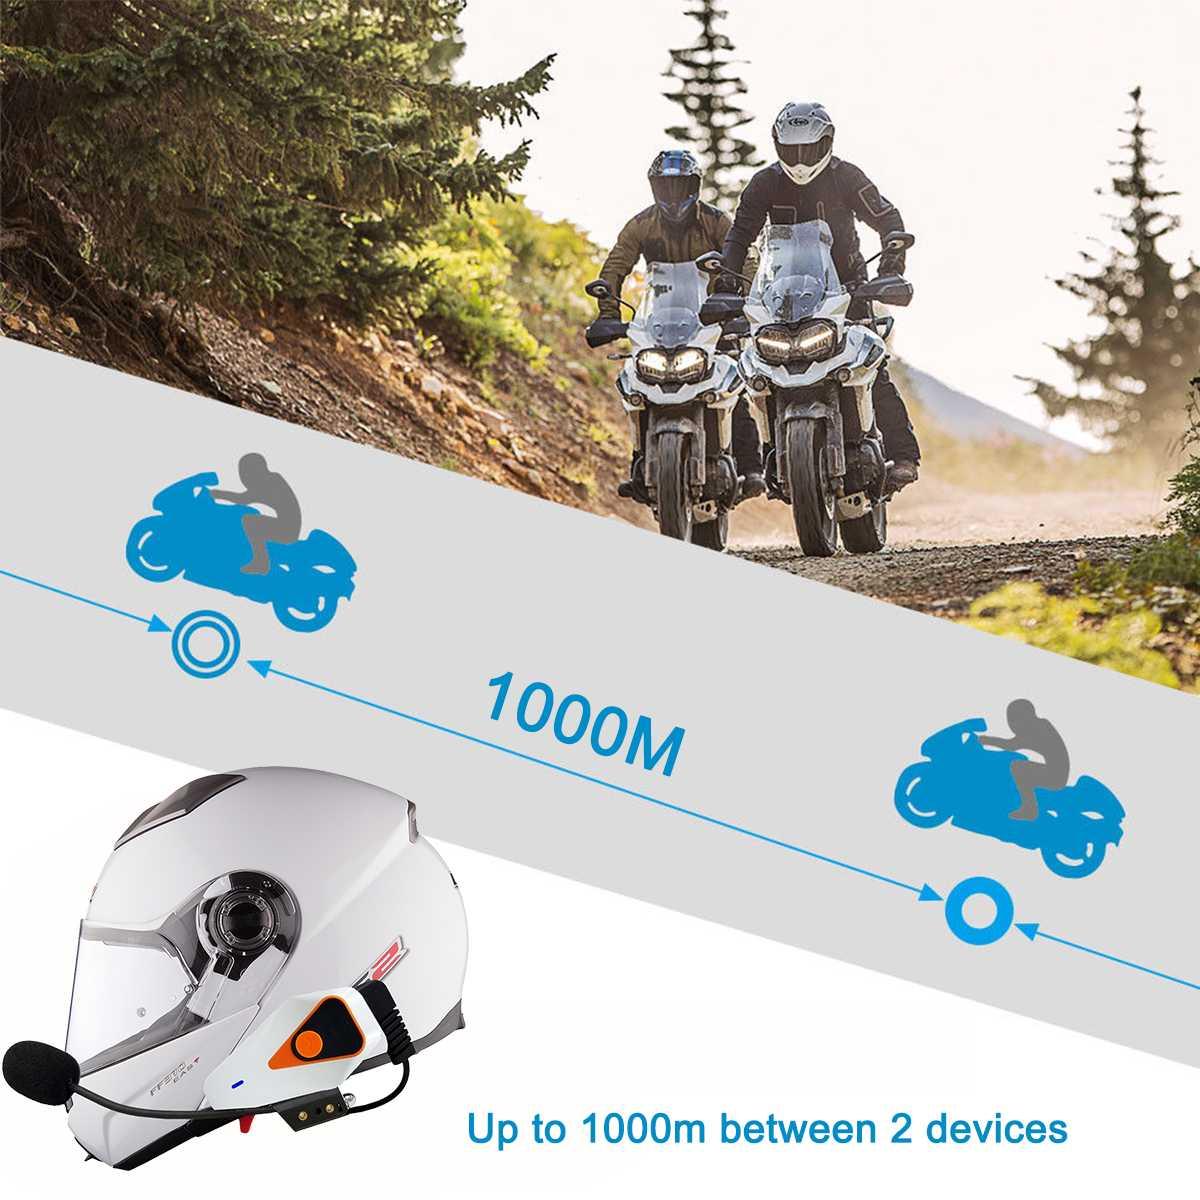 1000 M Bluetooth 3,0 EDR Wasserdichte moto rcycle Helm Sprechanlage Intercom Radio Headset 750 mAh Intercom moto moto rcycle Intercom